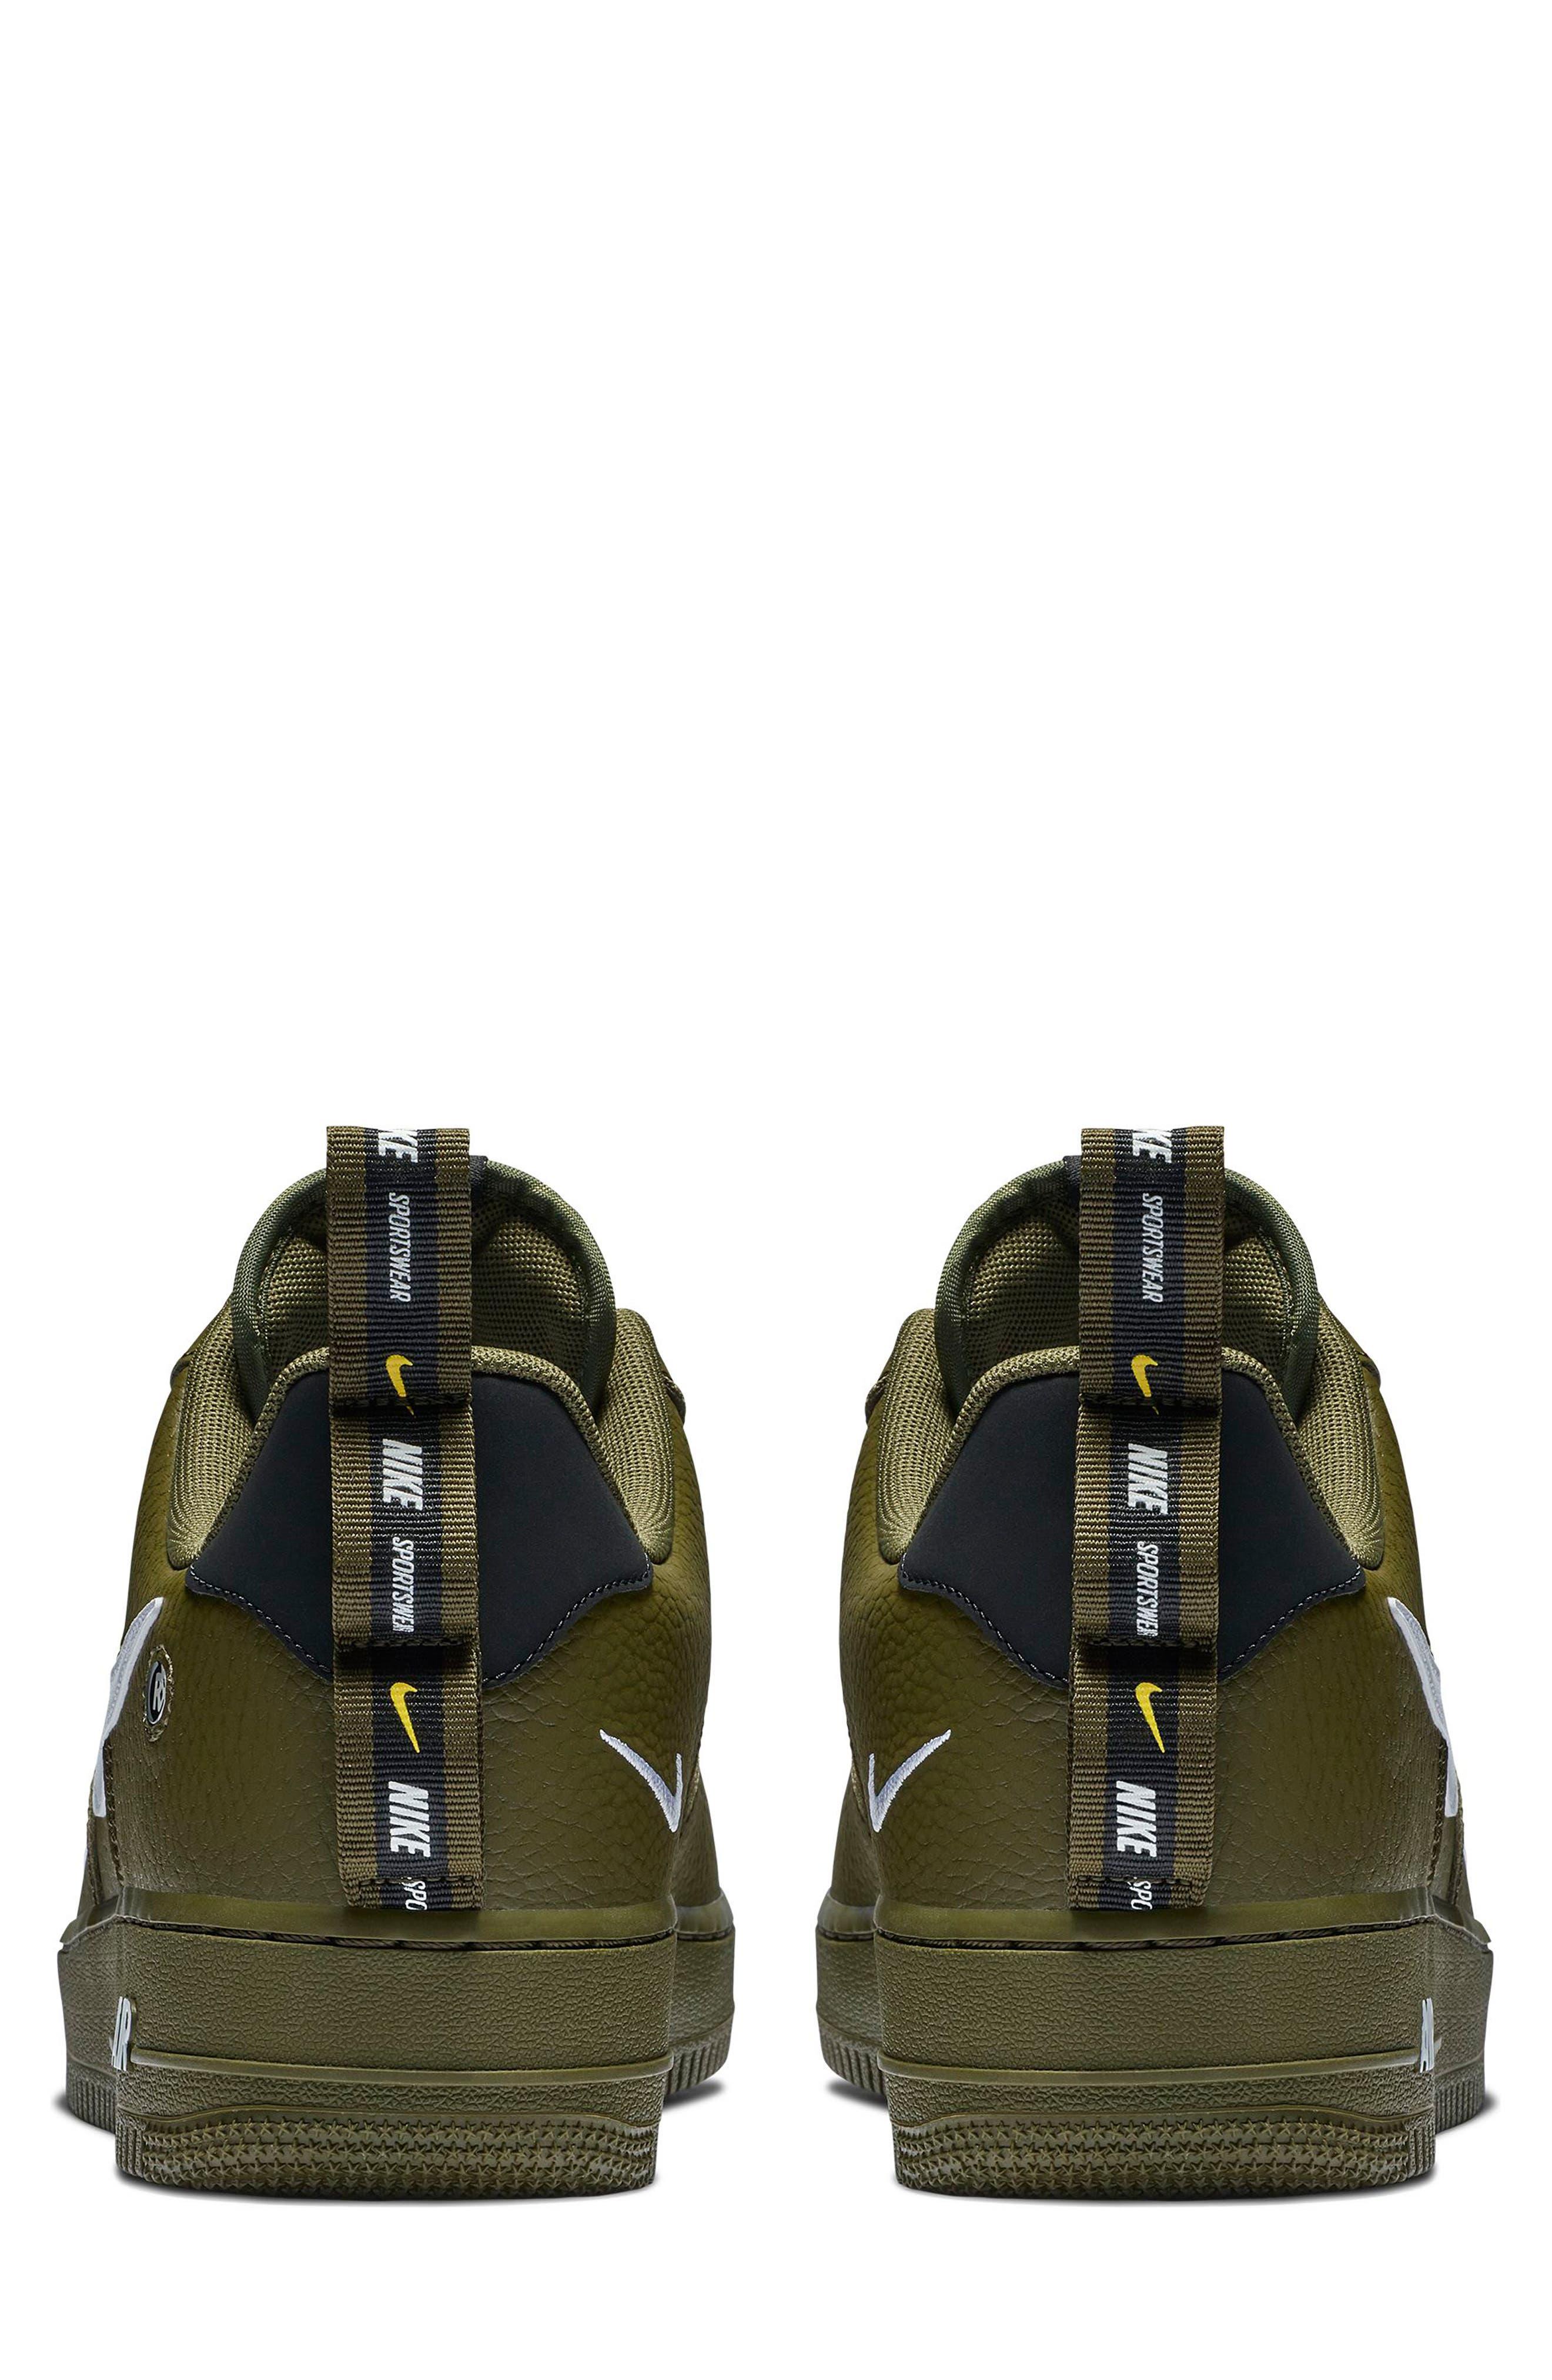 Air Force 1 '07 LV8 Utility Sneaker,                             Alternate thumbnail 2, color,                             300